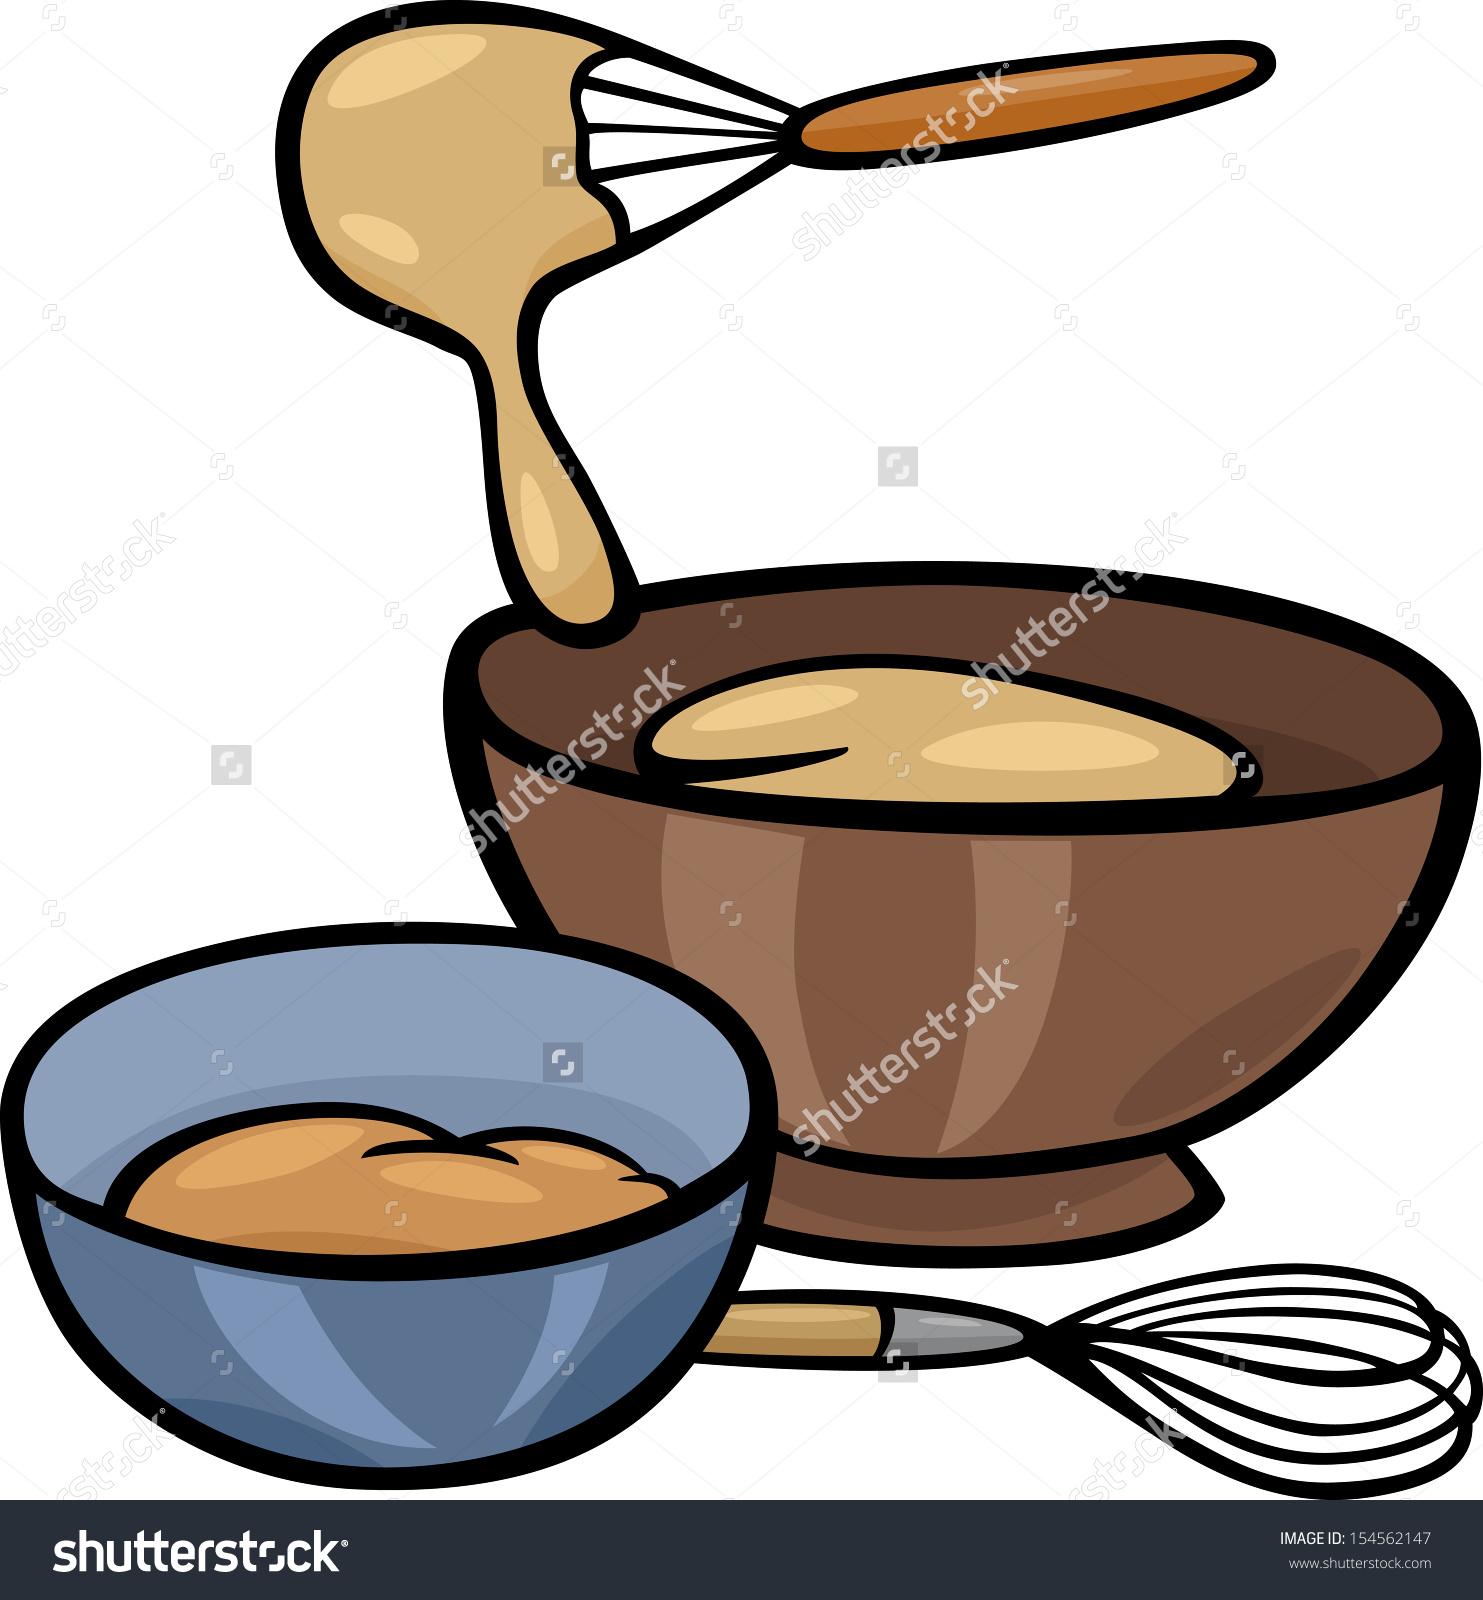 Food spoon black and. Bowl clipart cartoon